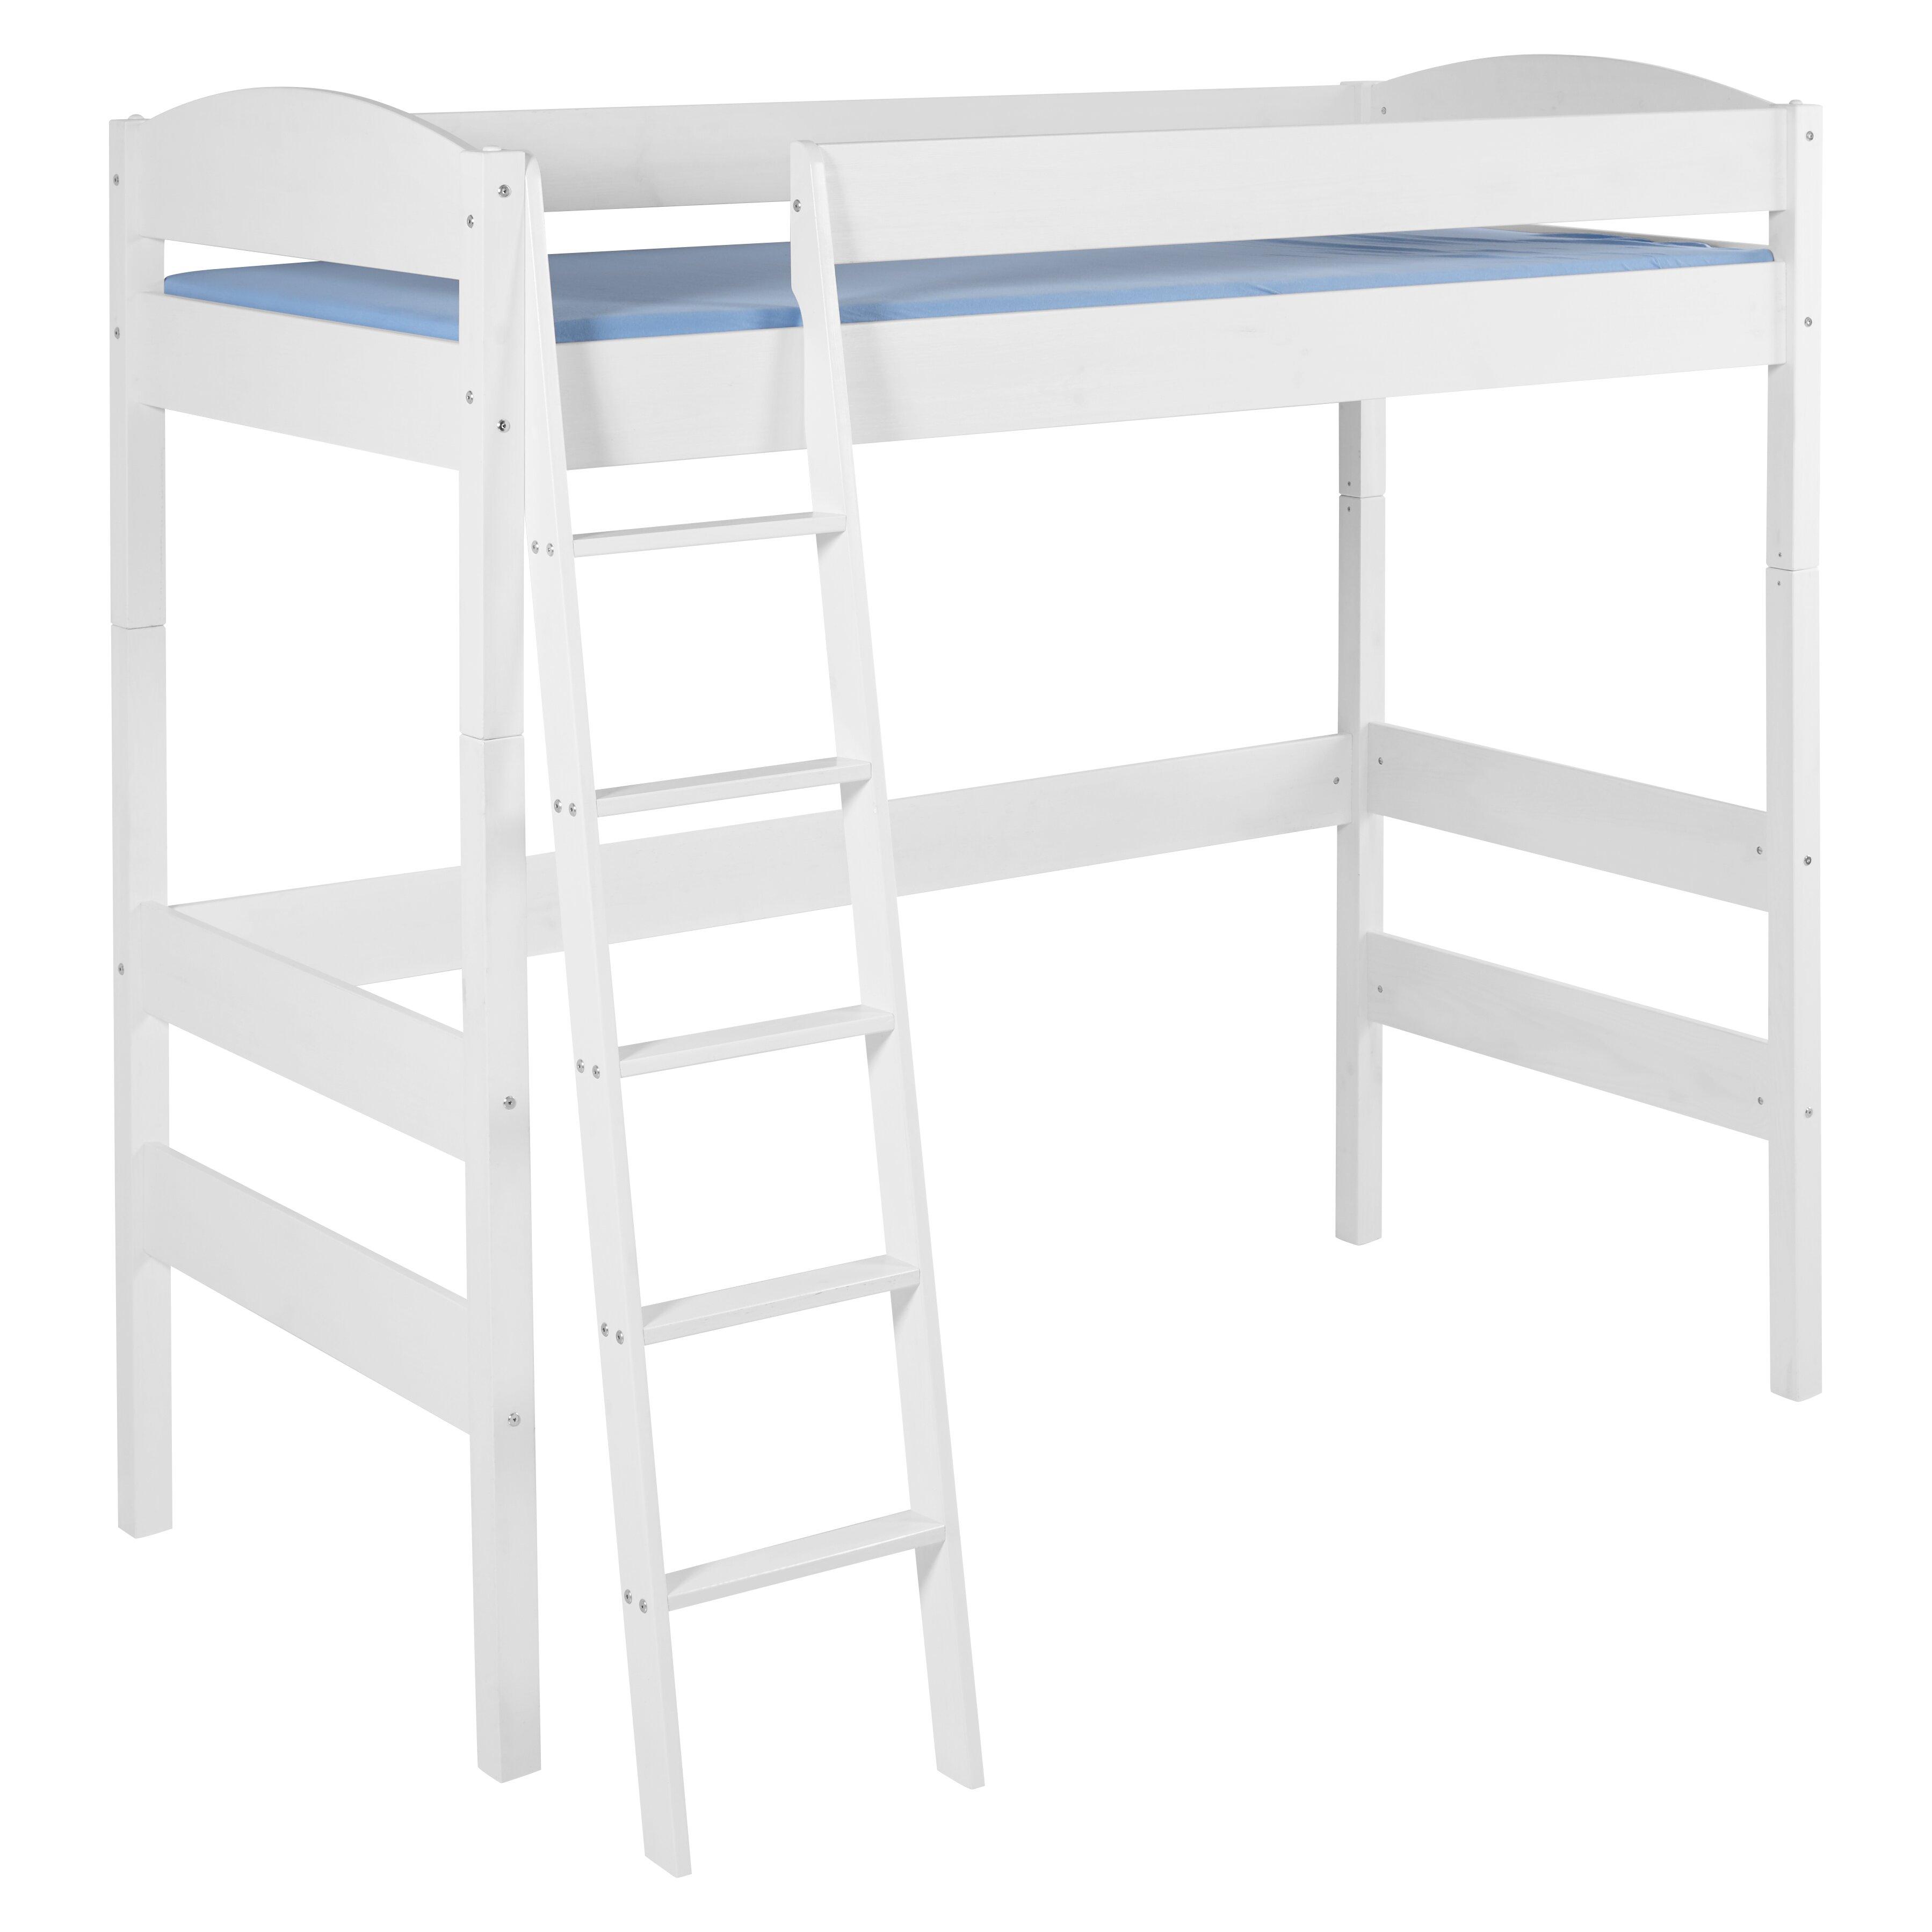 Wrigglebox european single high sleeper bed reviews for High sleeper bed